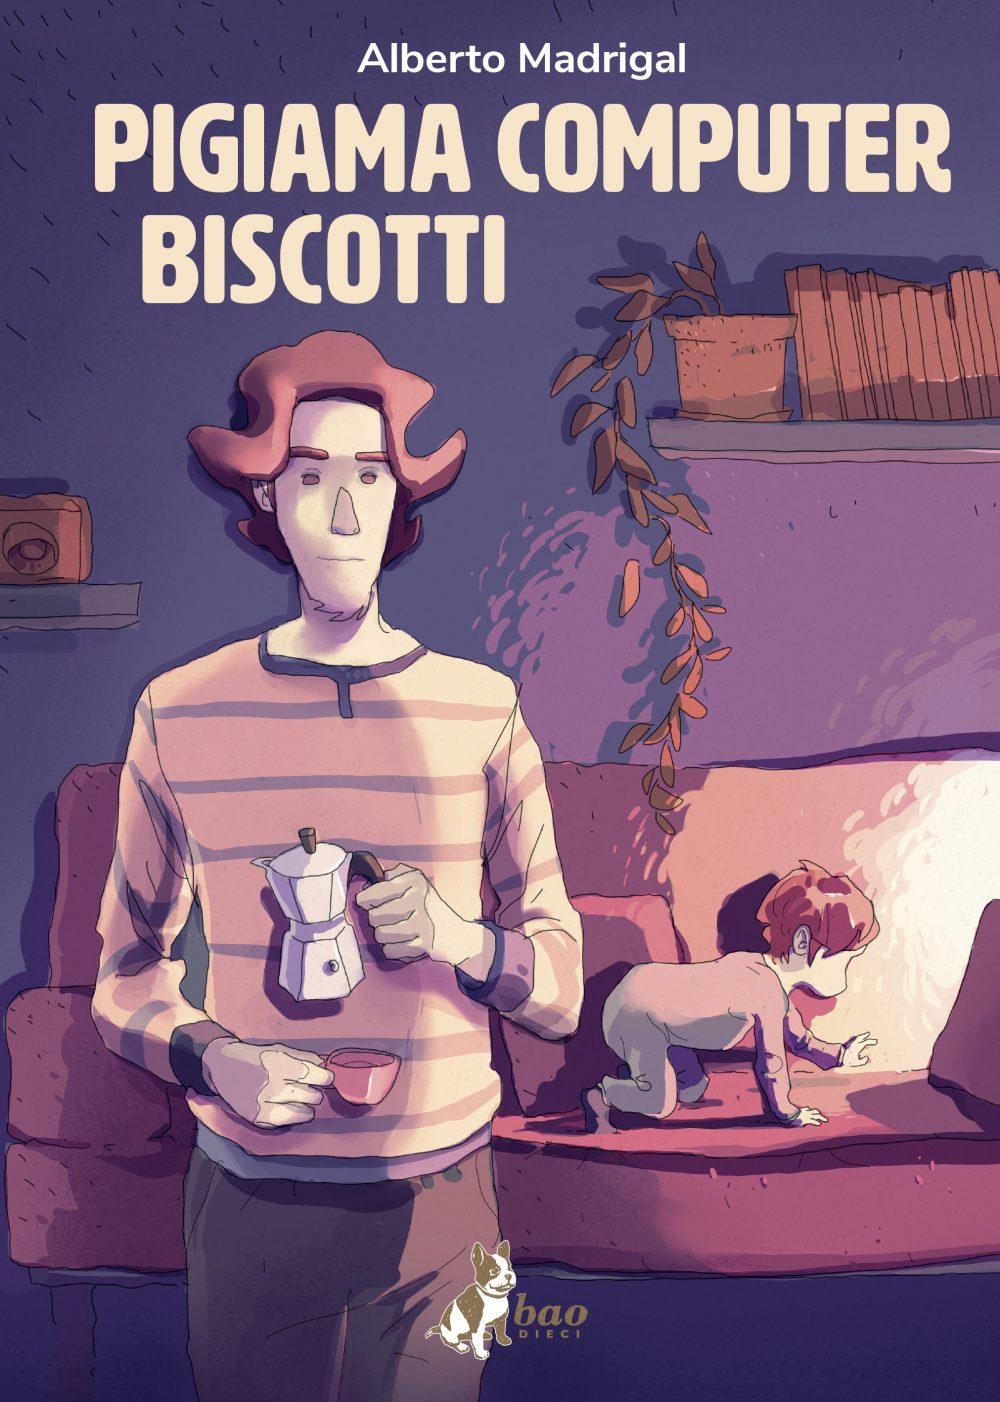 Pigiama computer biscotti, copertina di Alberto Madrigal